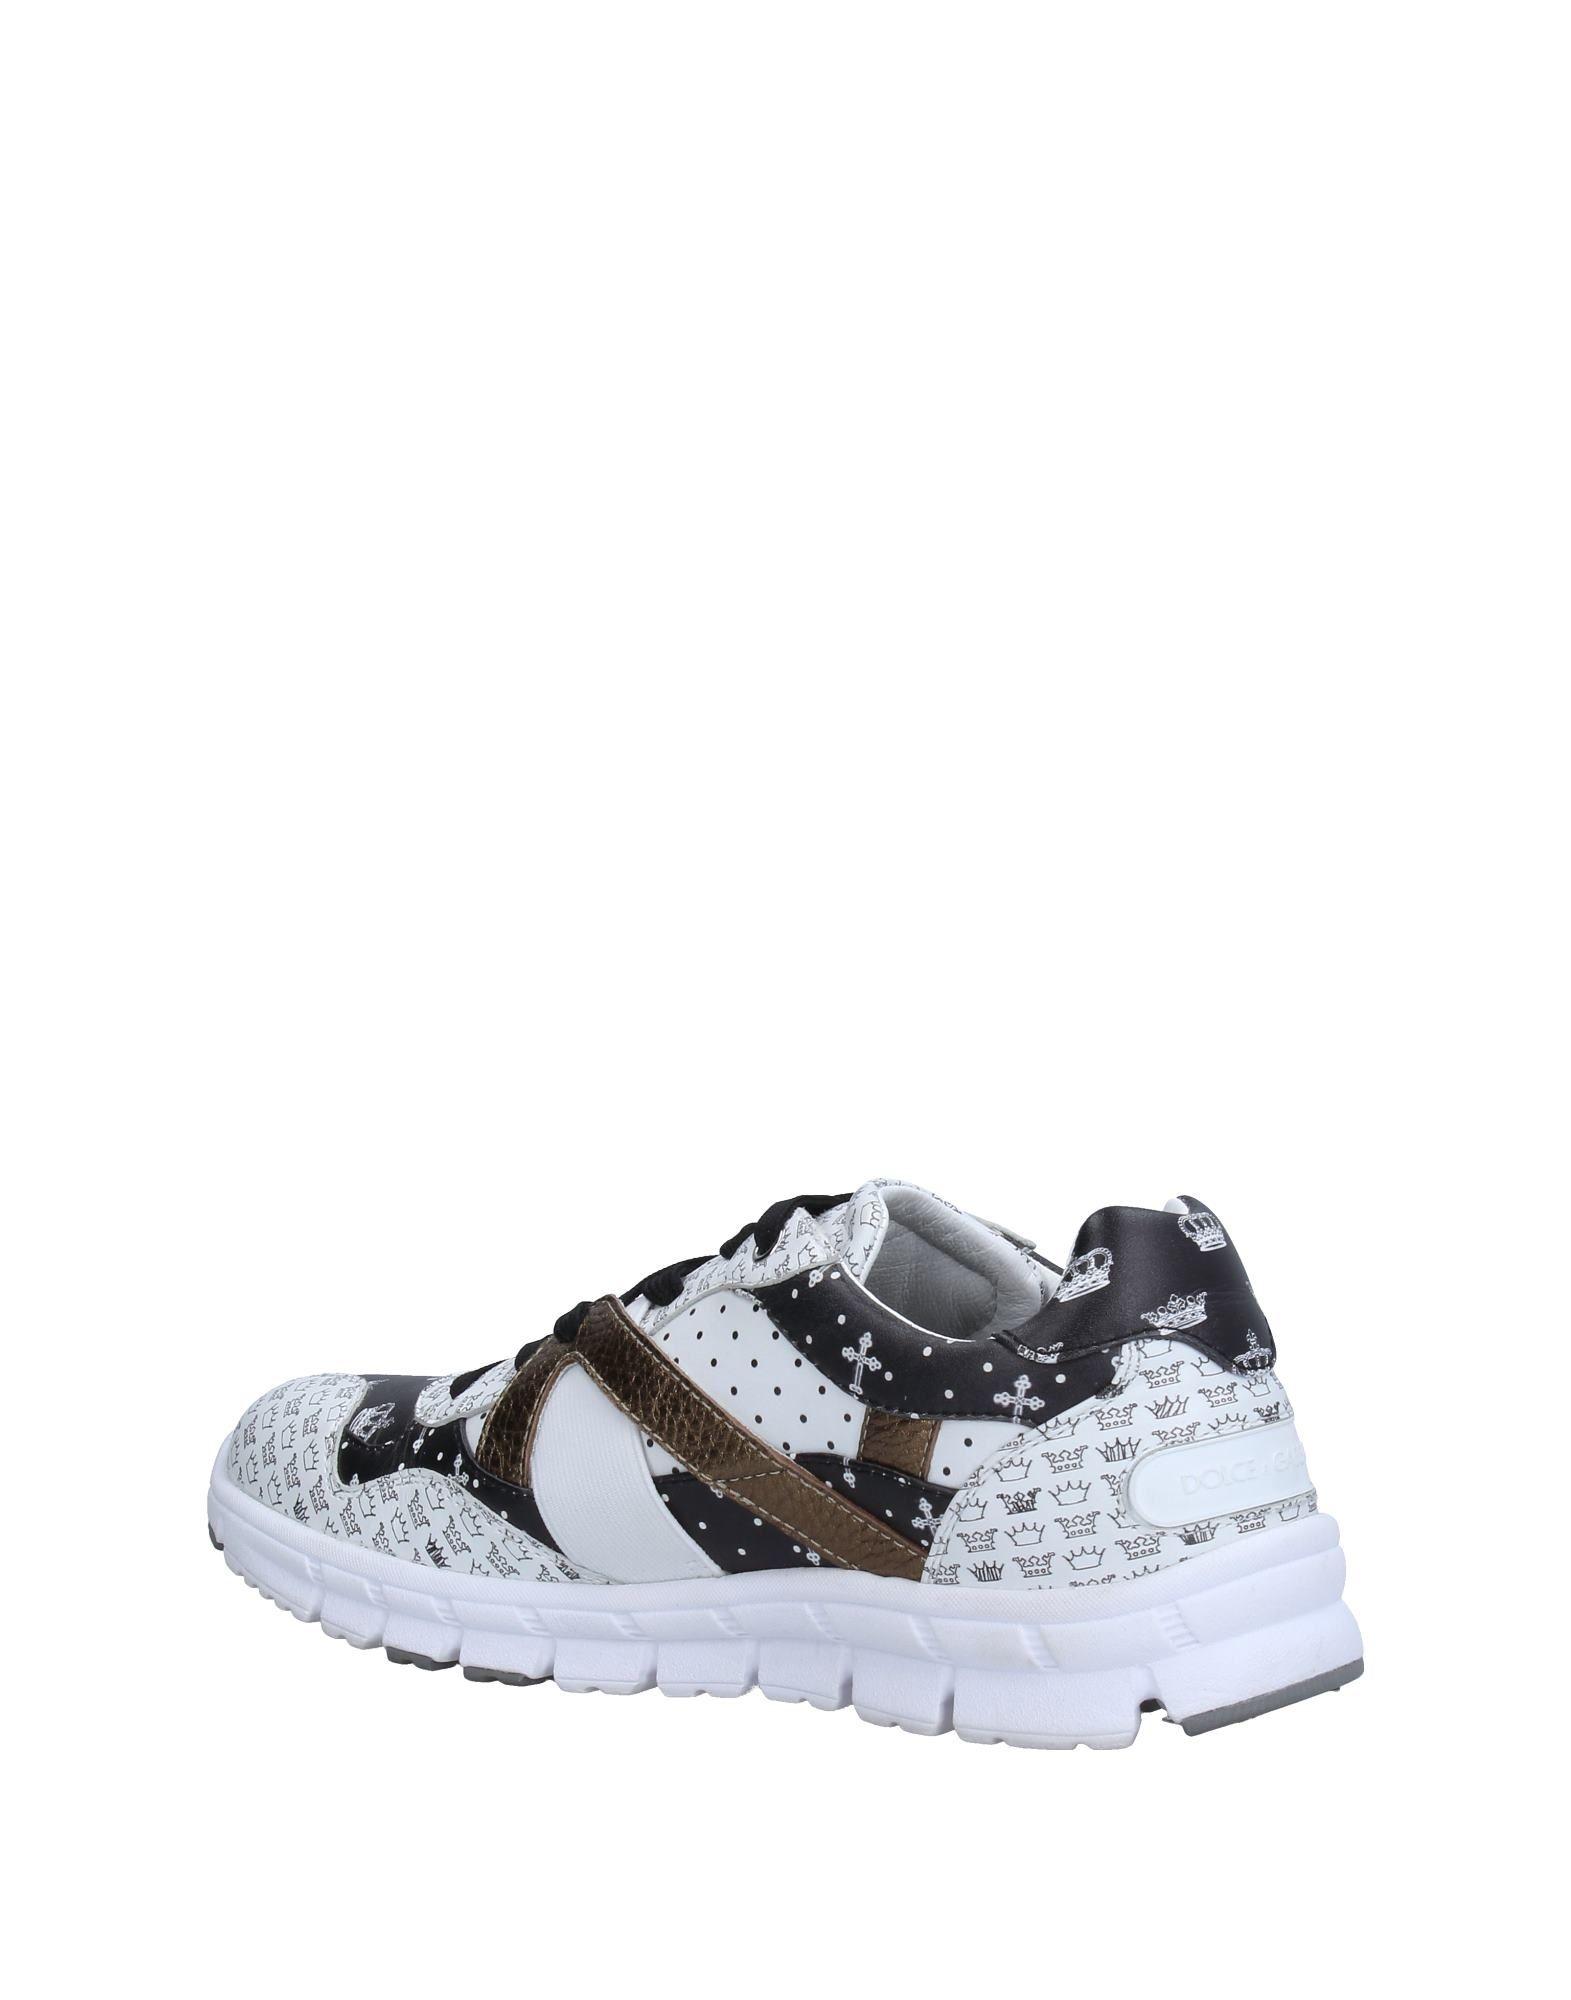 Dolce & Gabbana Sneakers Neue Herren  11242978CB Neue Sneakers Schuhe de495a